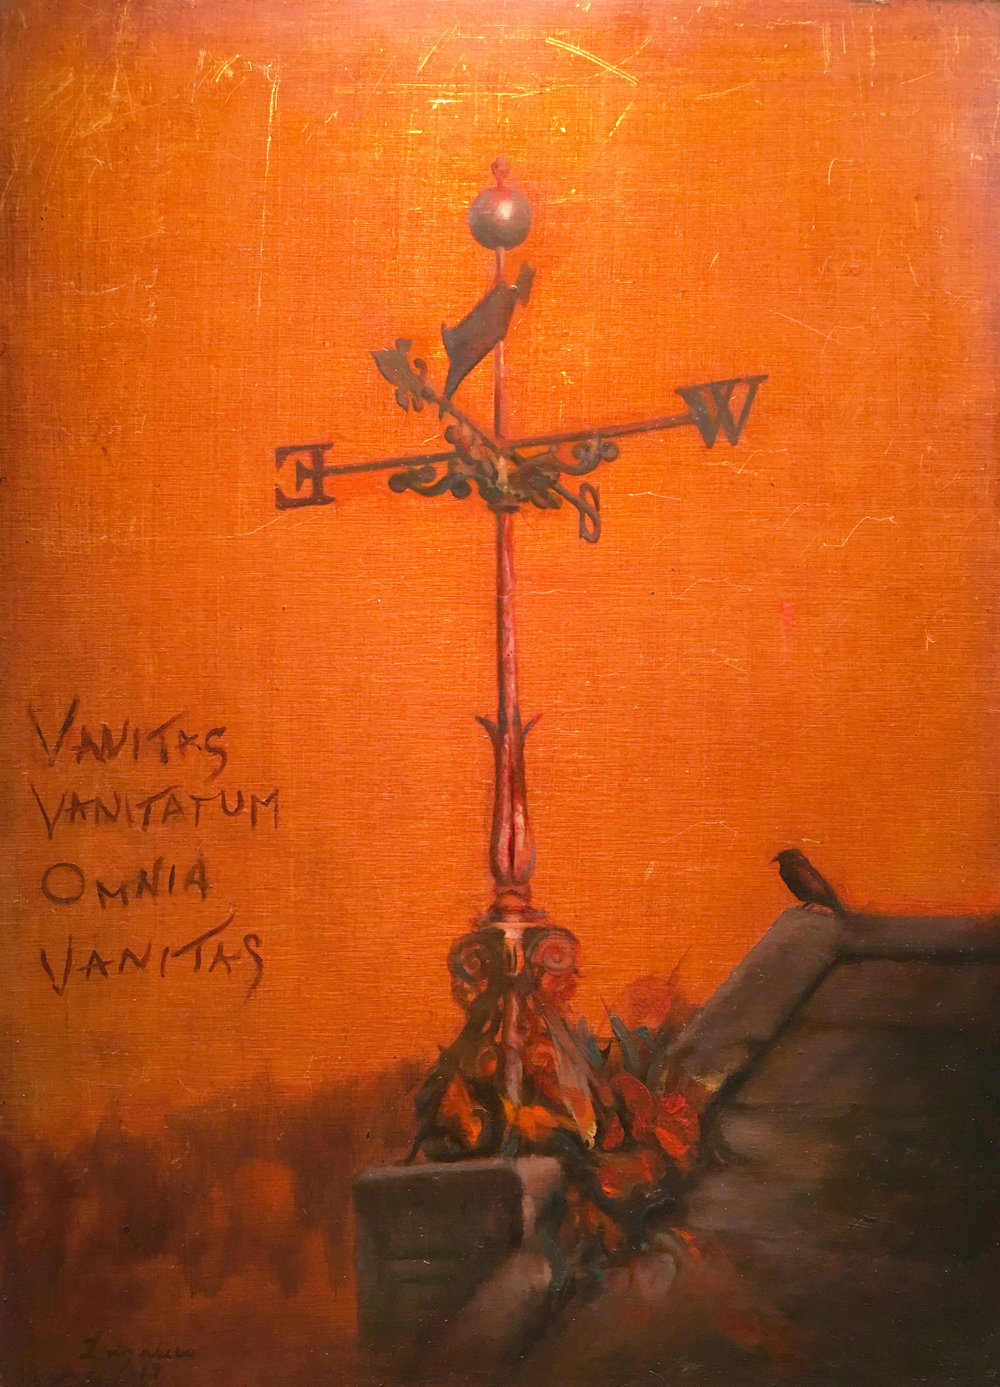 Vanitas (study) 9 x 12.5 in. Oil on aluminum.